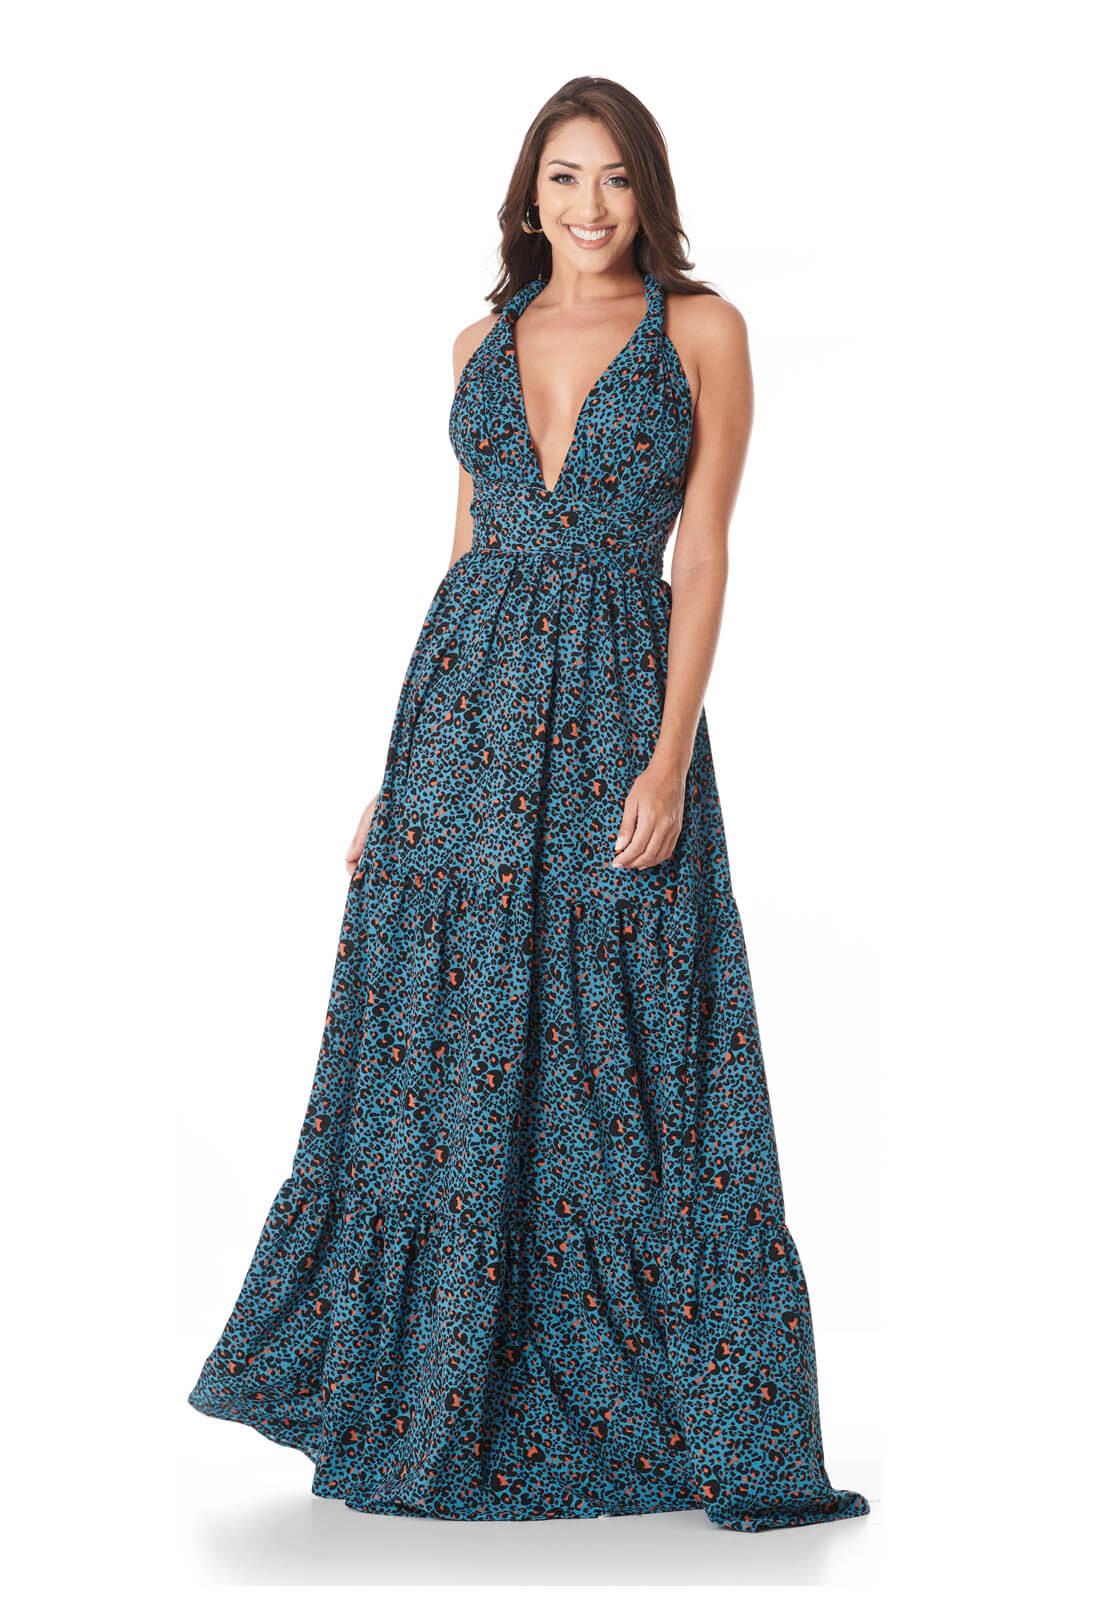 Vestido Longo Mil Formas Camadas Onça Azul E Laranja